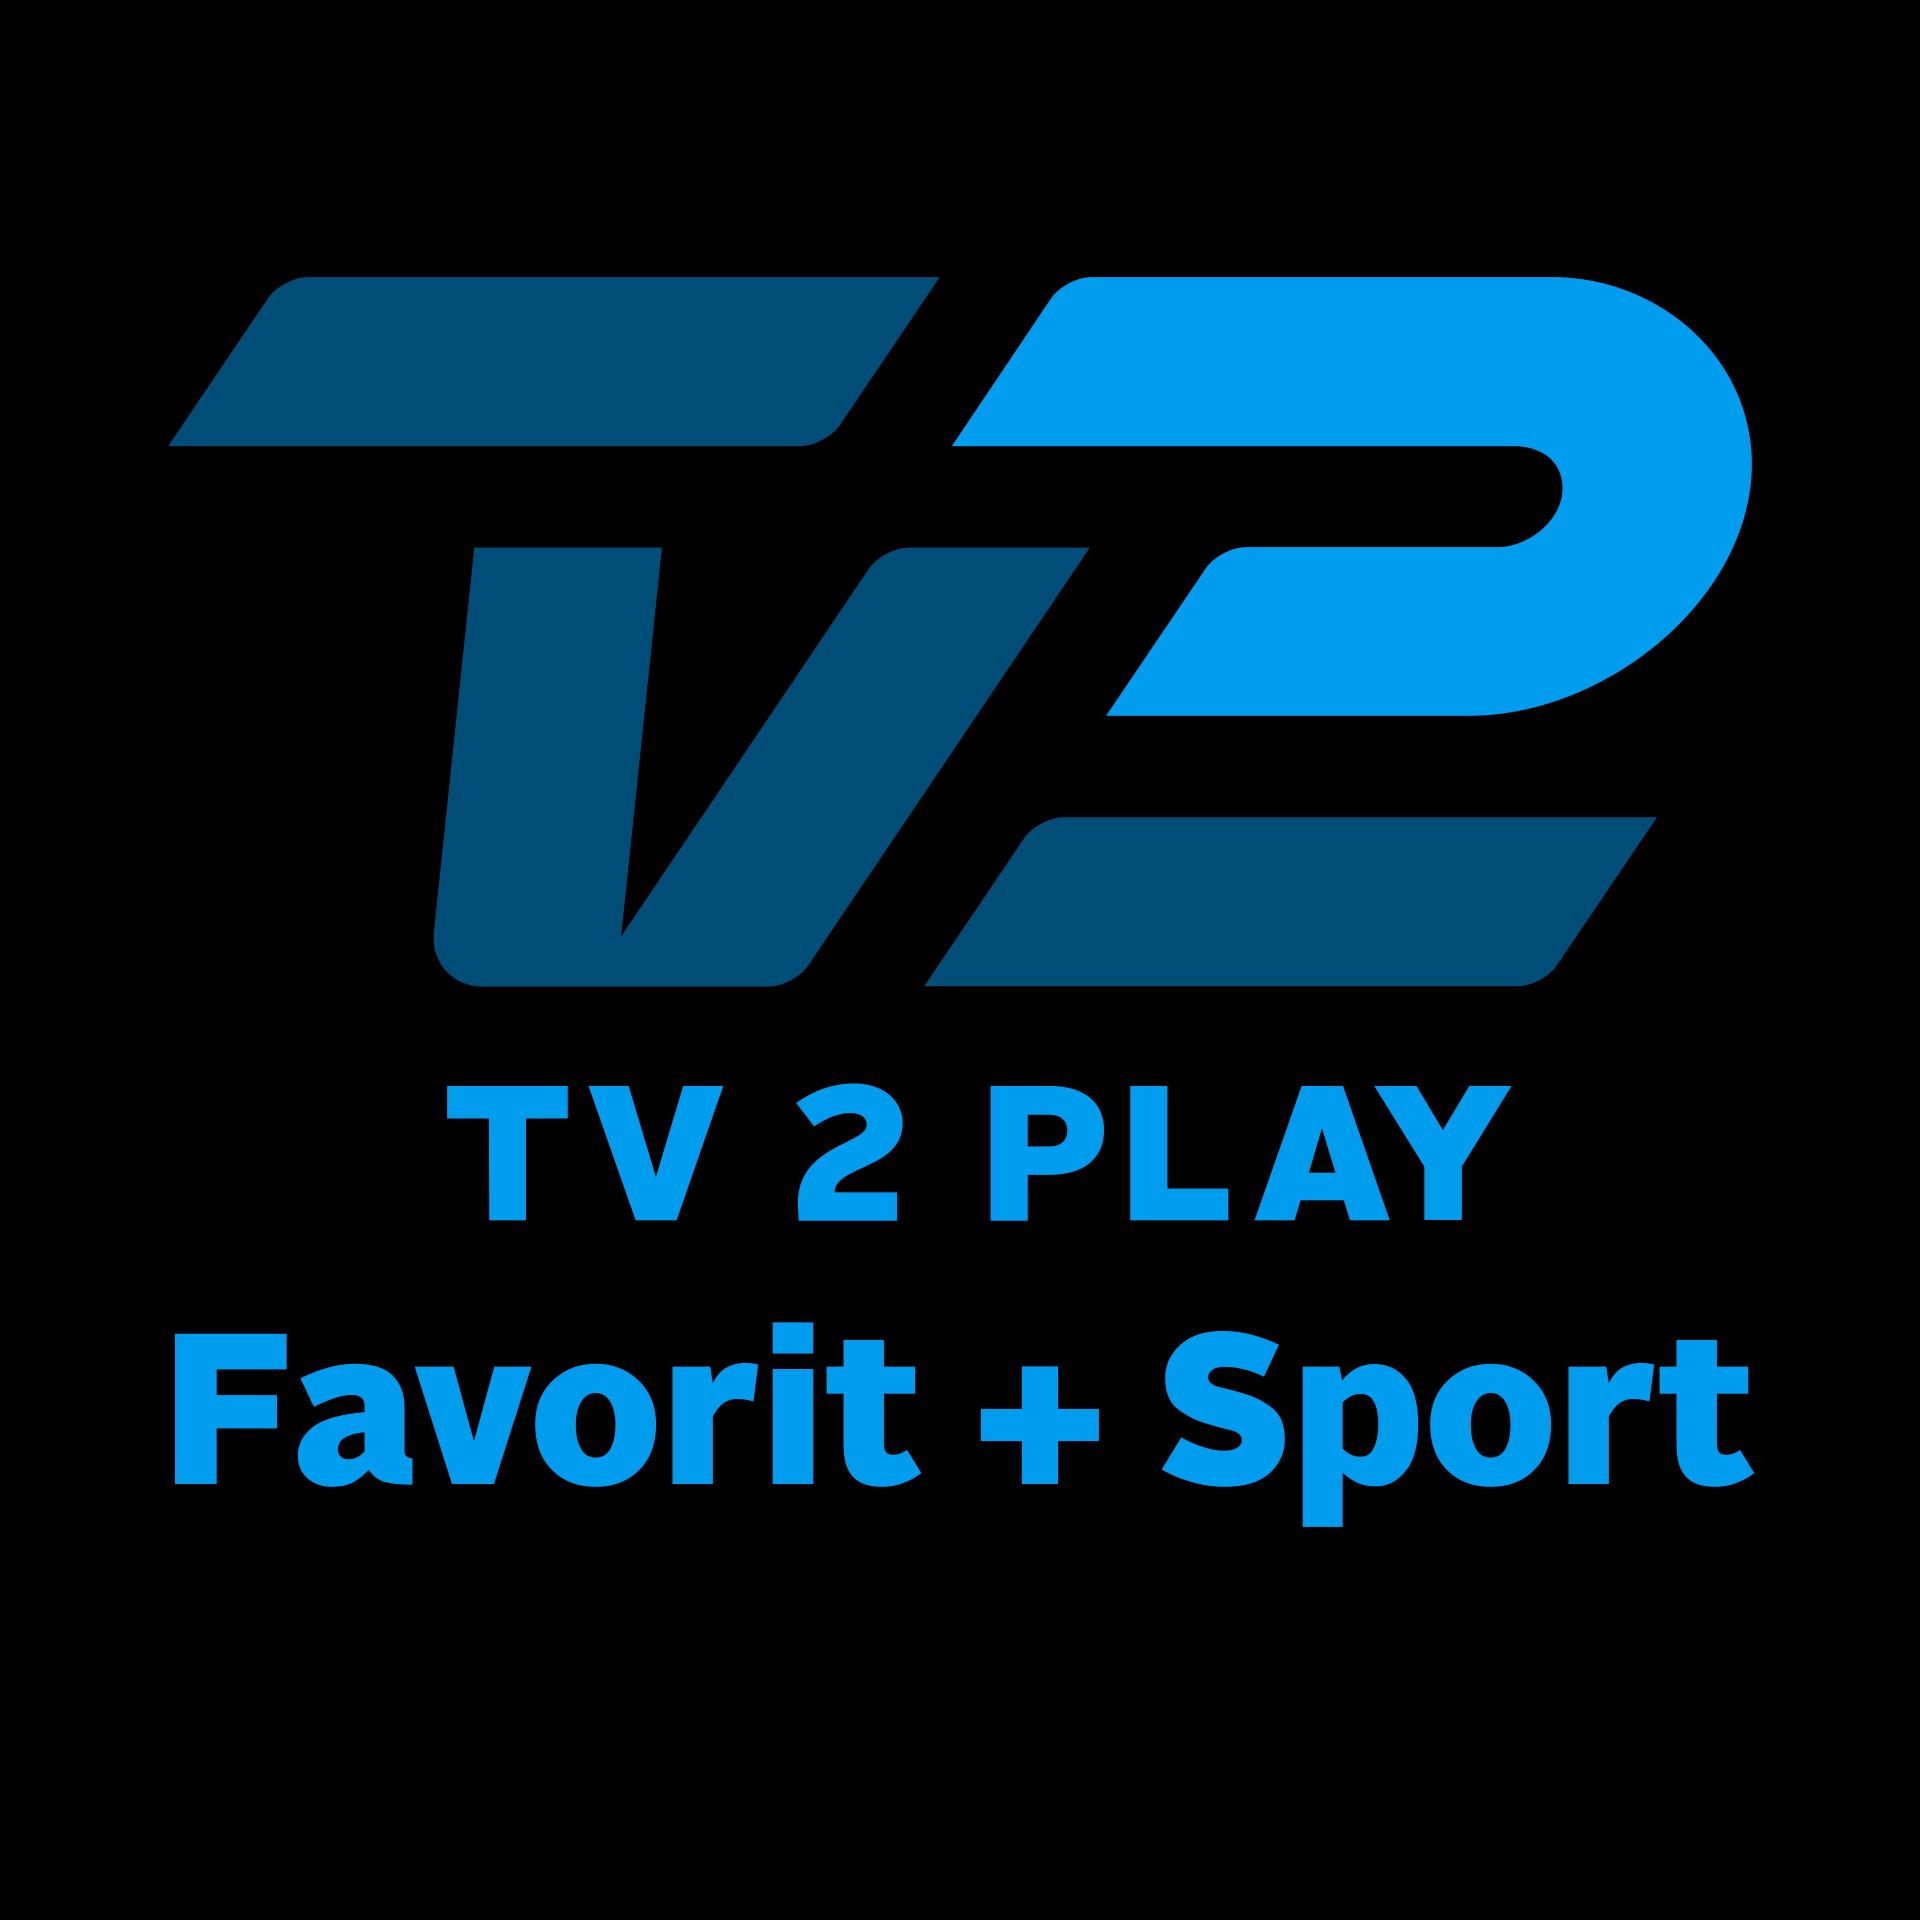 TV 2 PLAY F+S logo